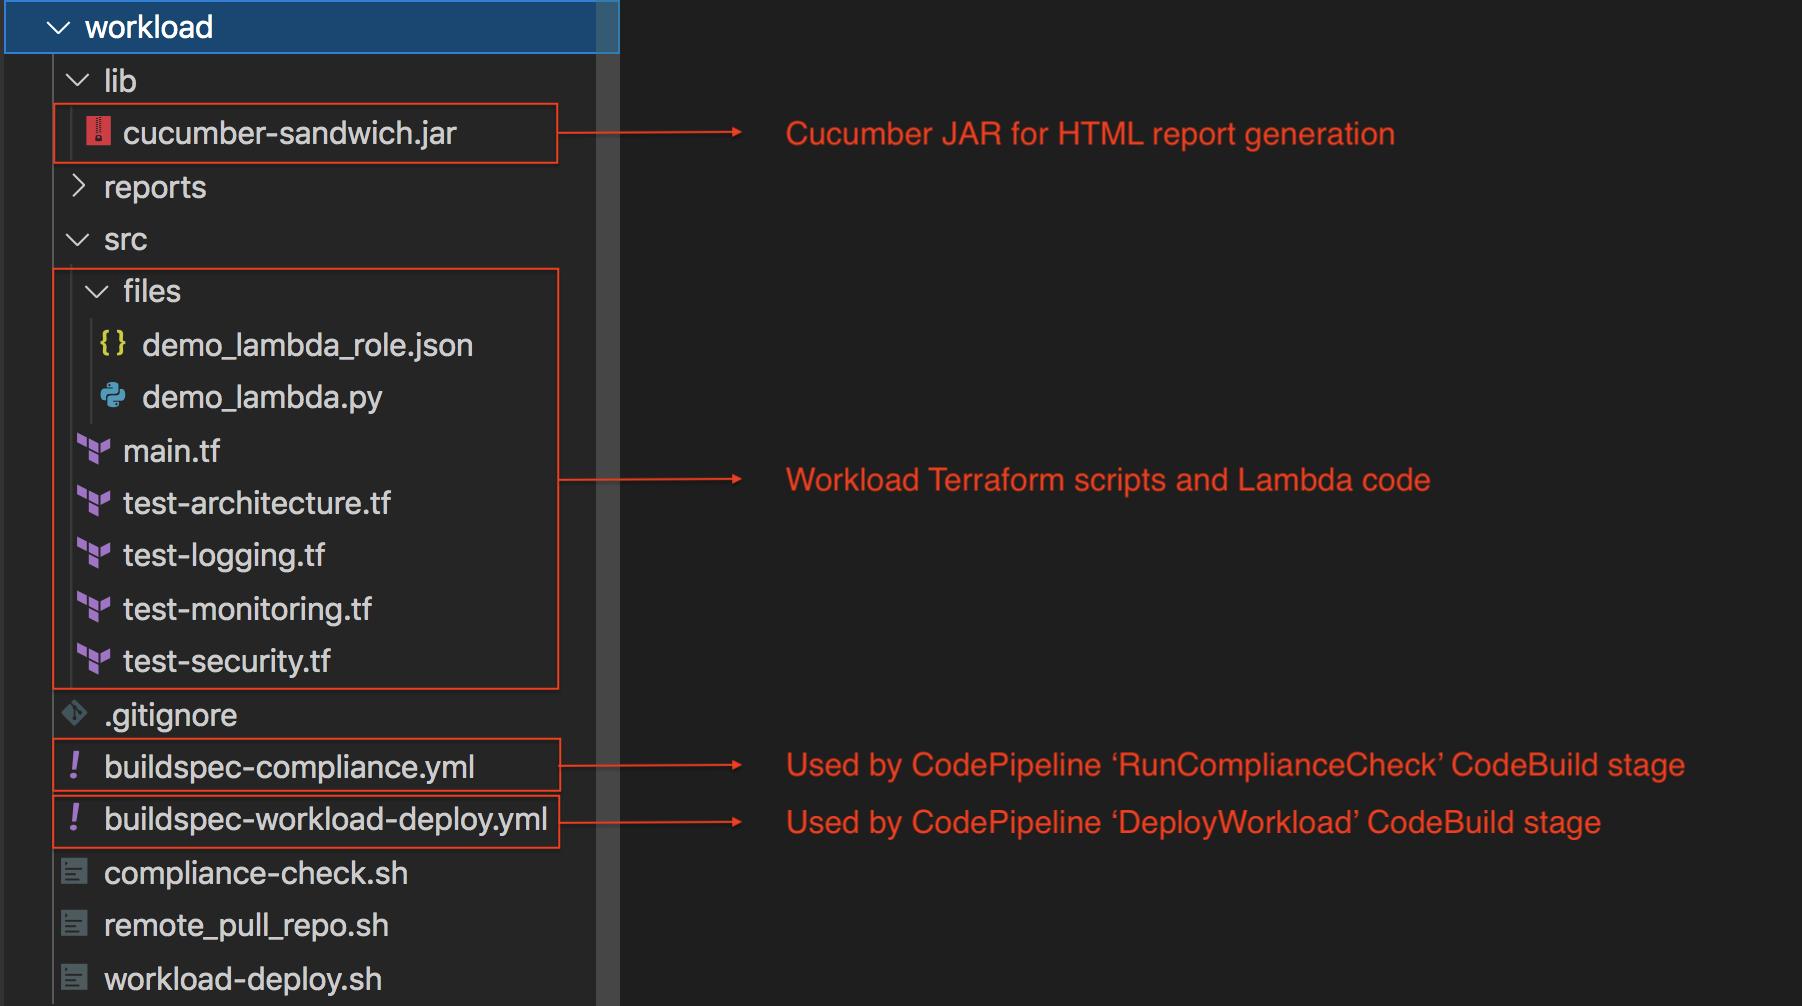 workload code folder structure